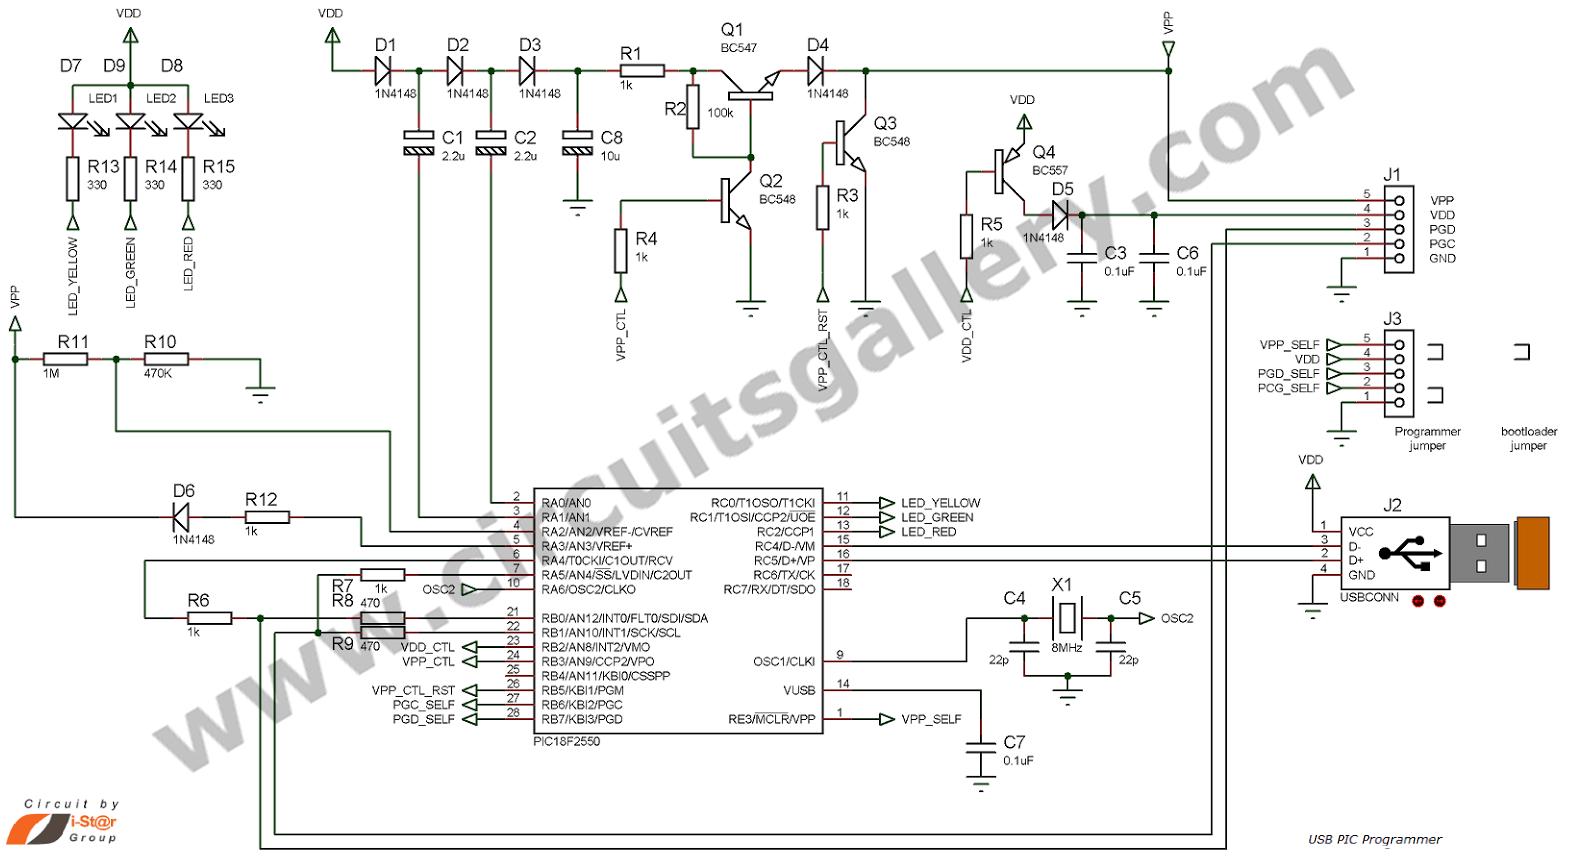 usb pic programmer schematic diagram auto electrical  auto electrical wiring diagram